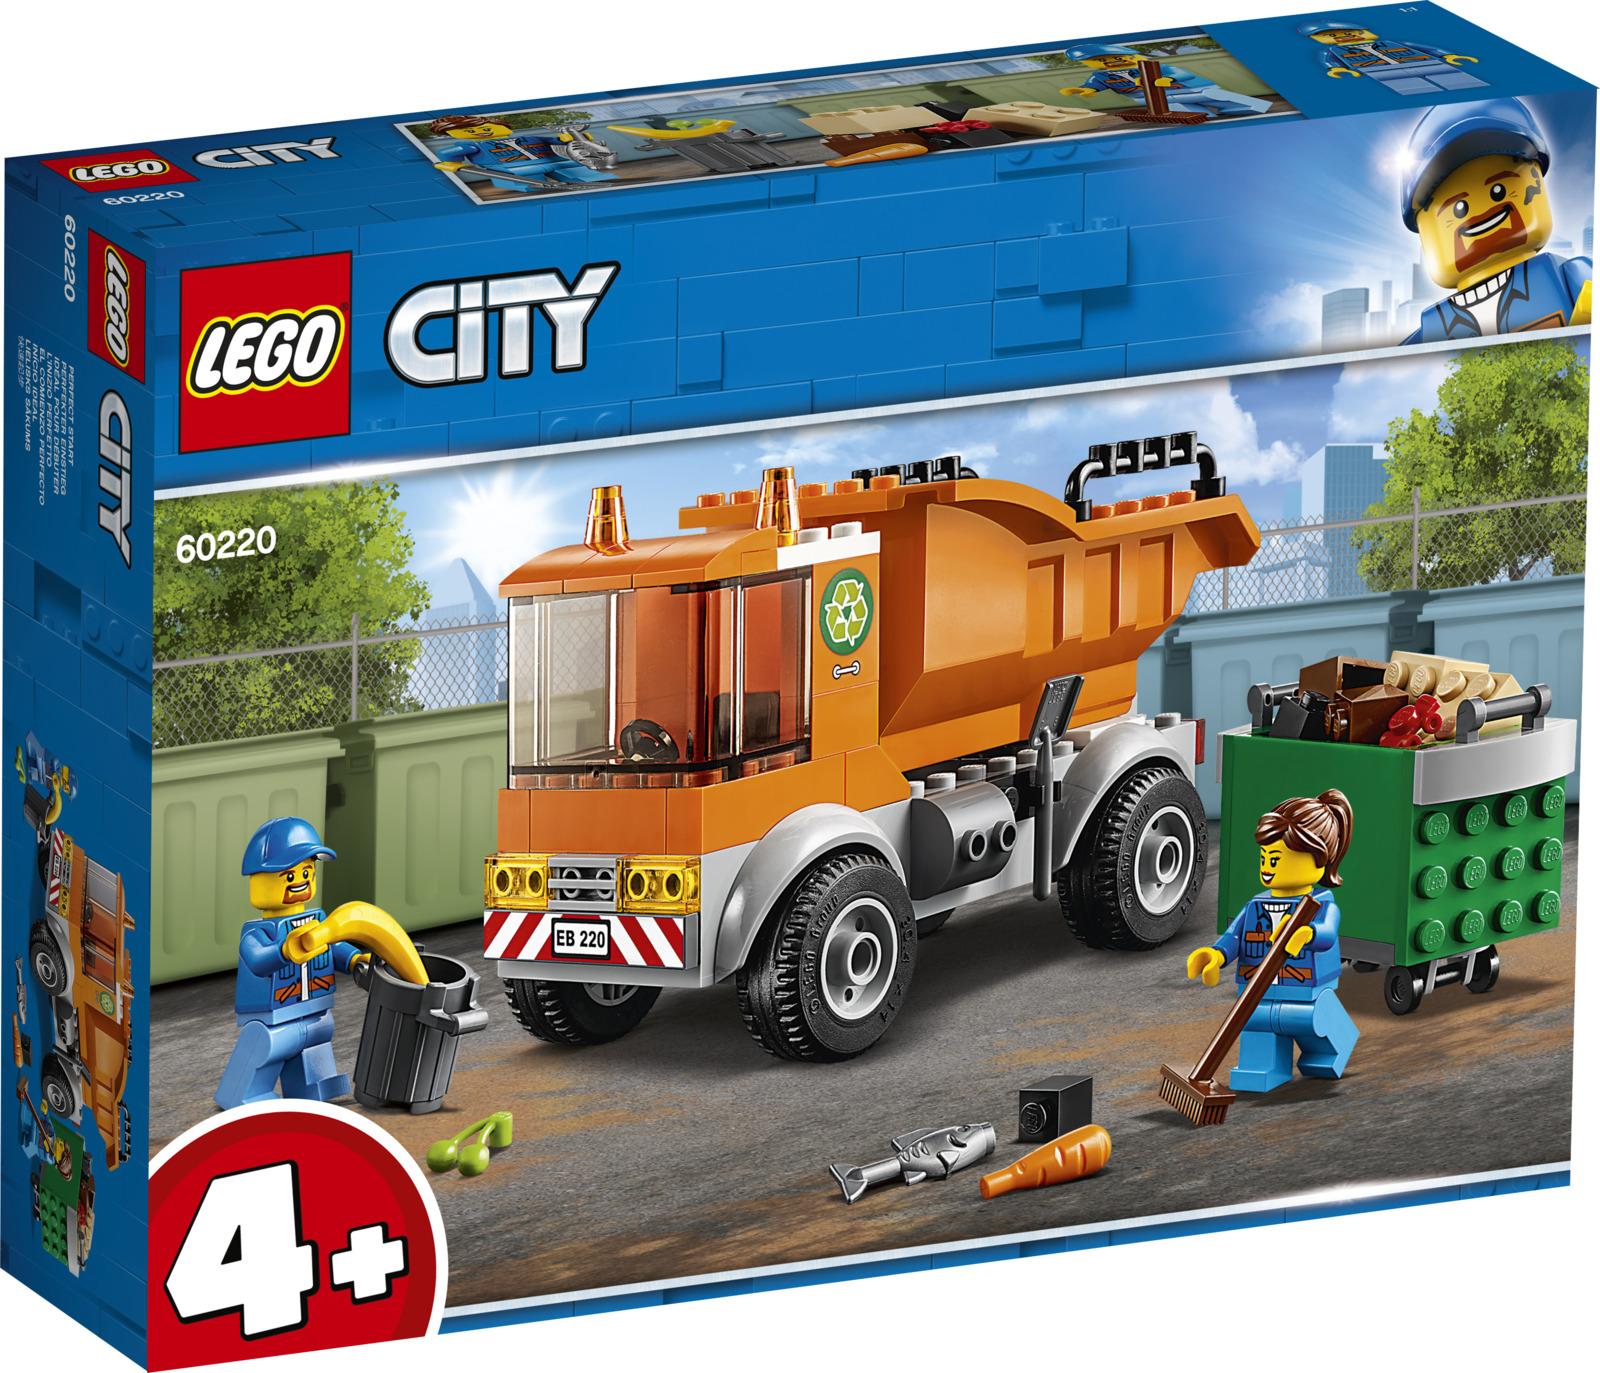 LEGO City Great Vehicles 60220 Мусоровоз Конструктор